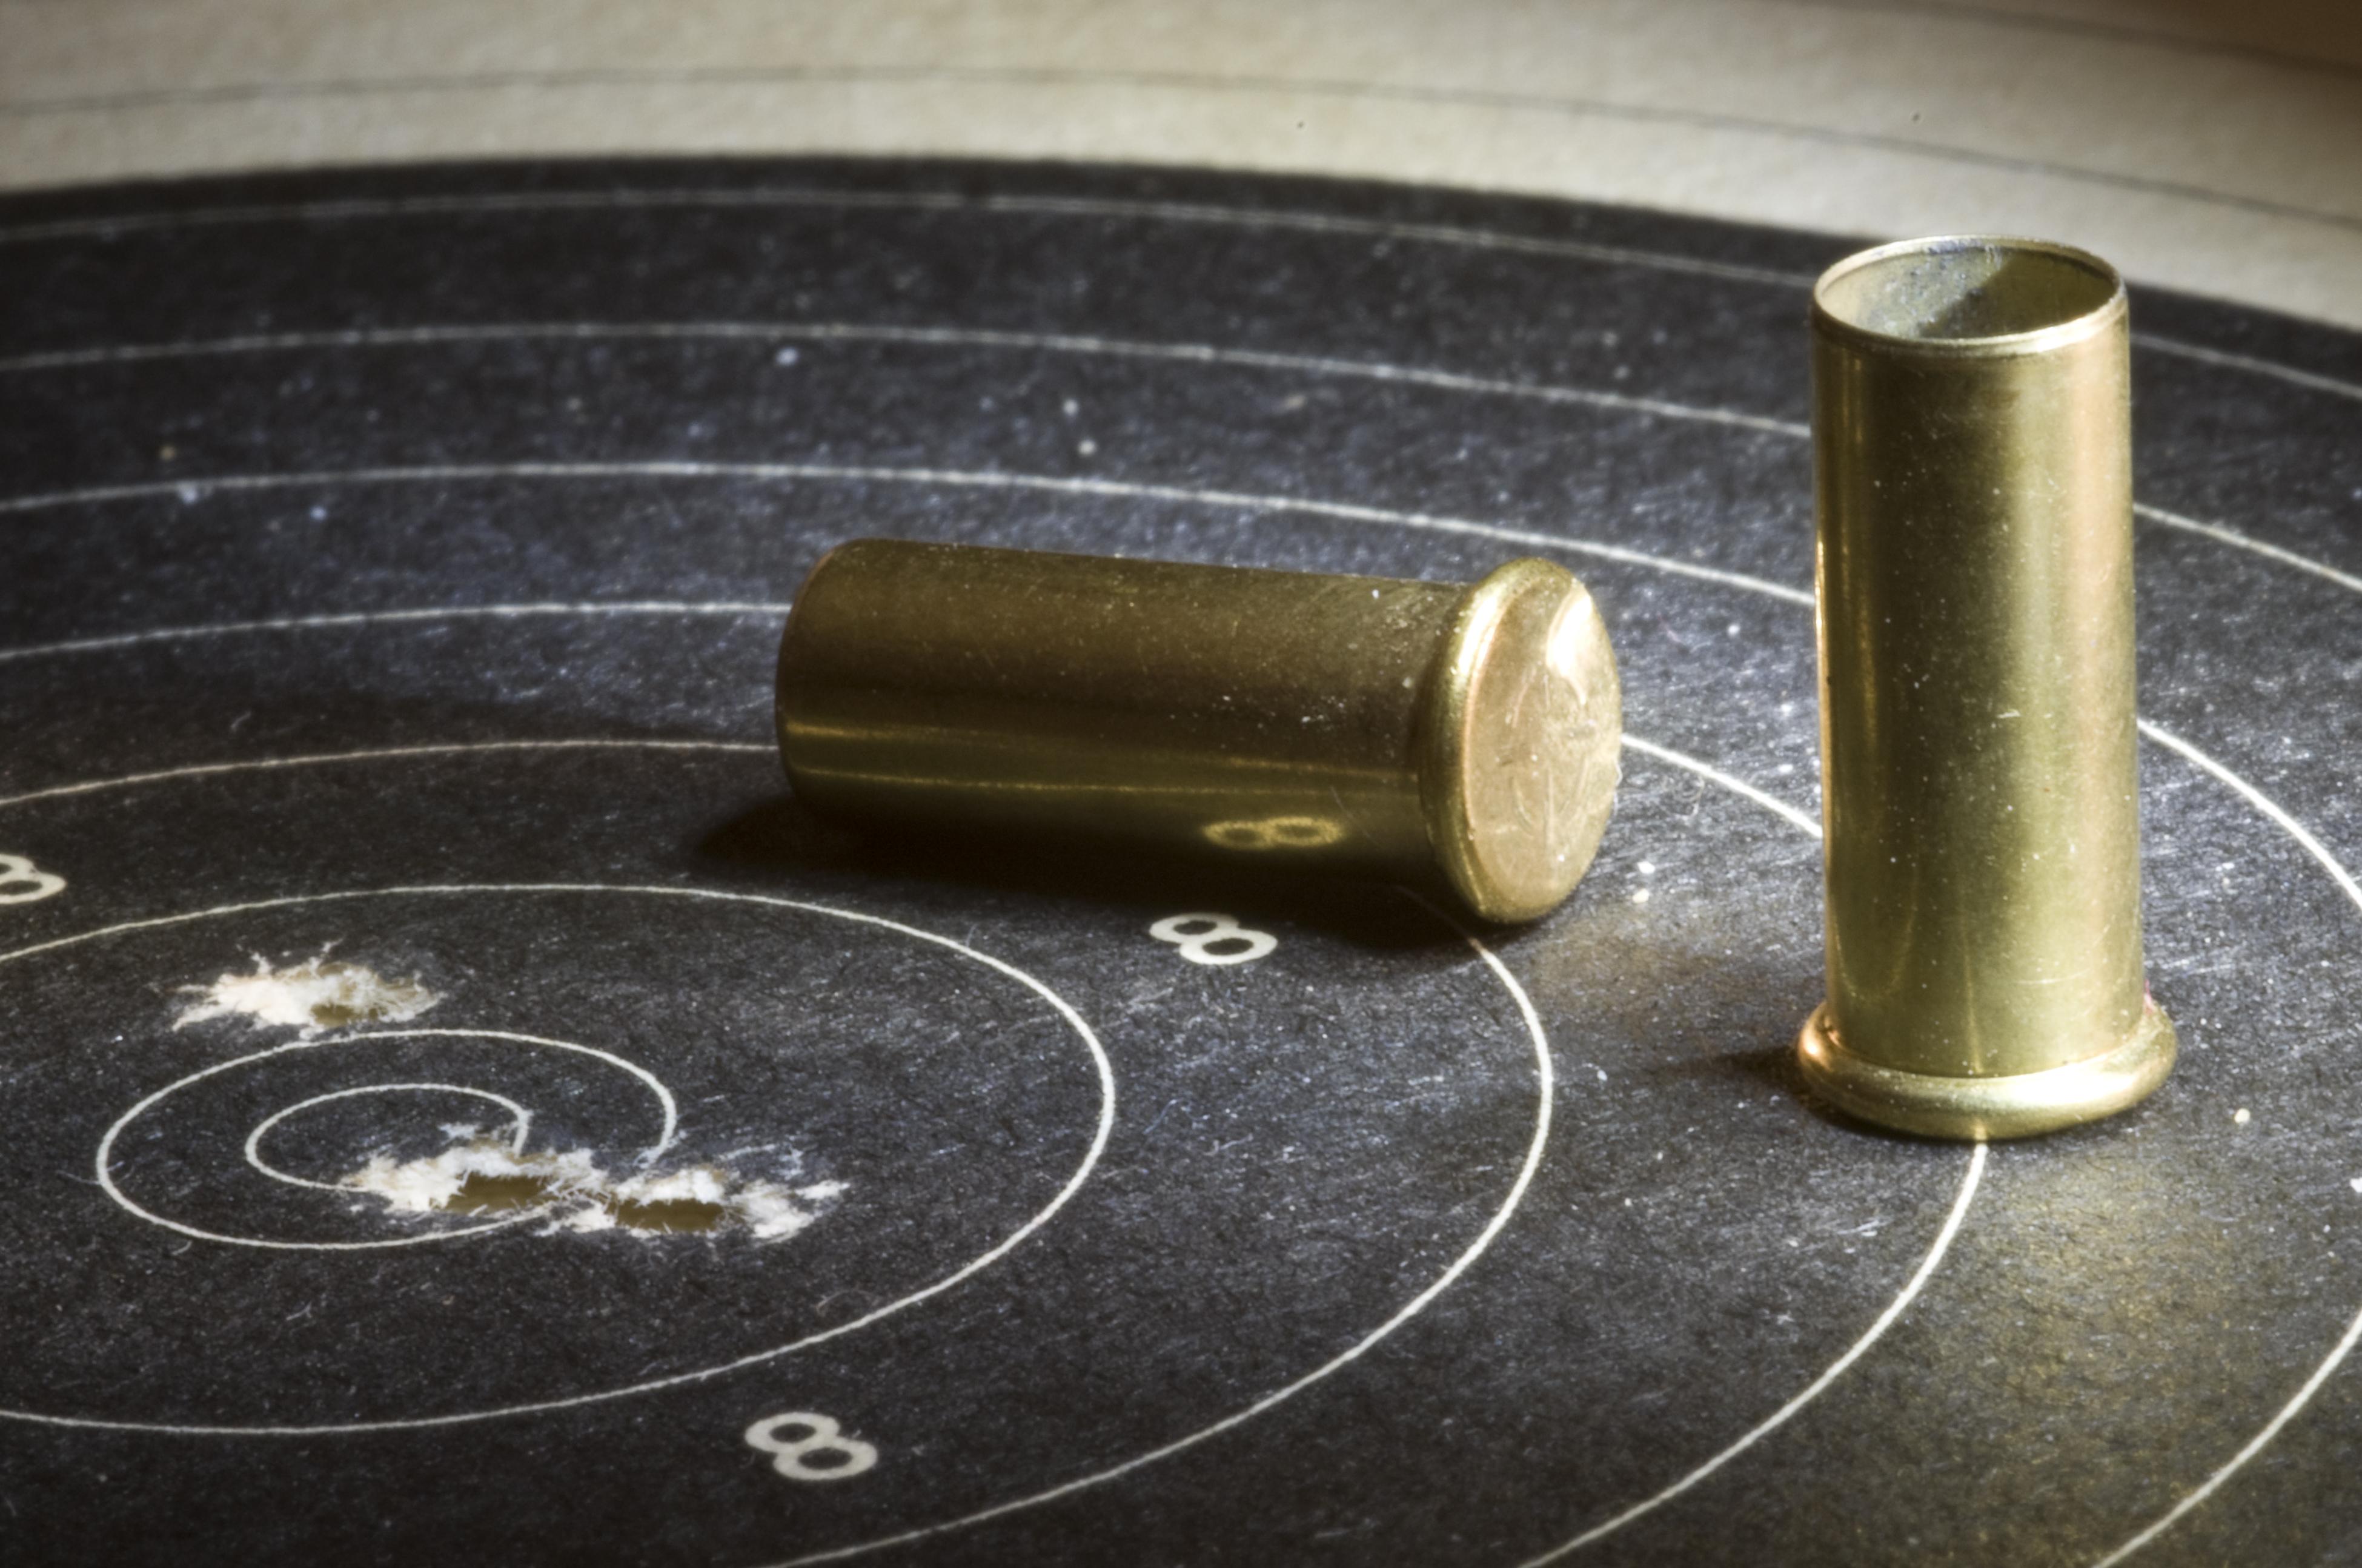 setting up a gun range